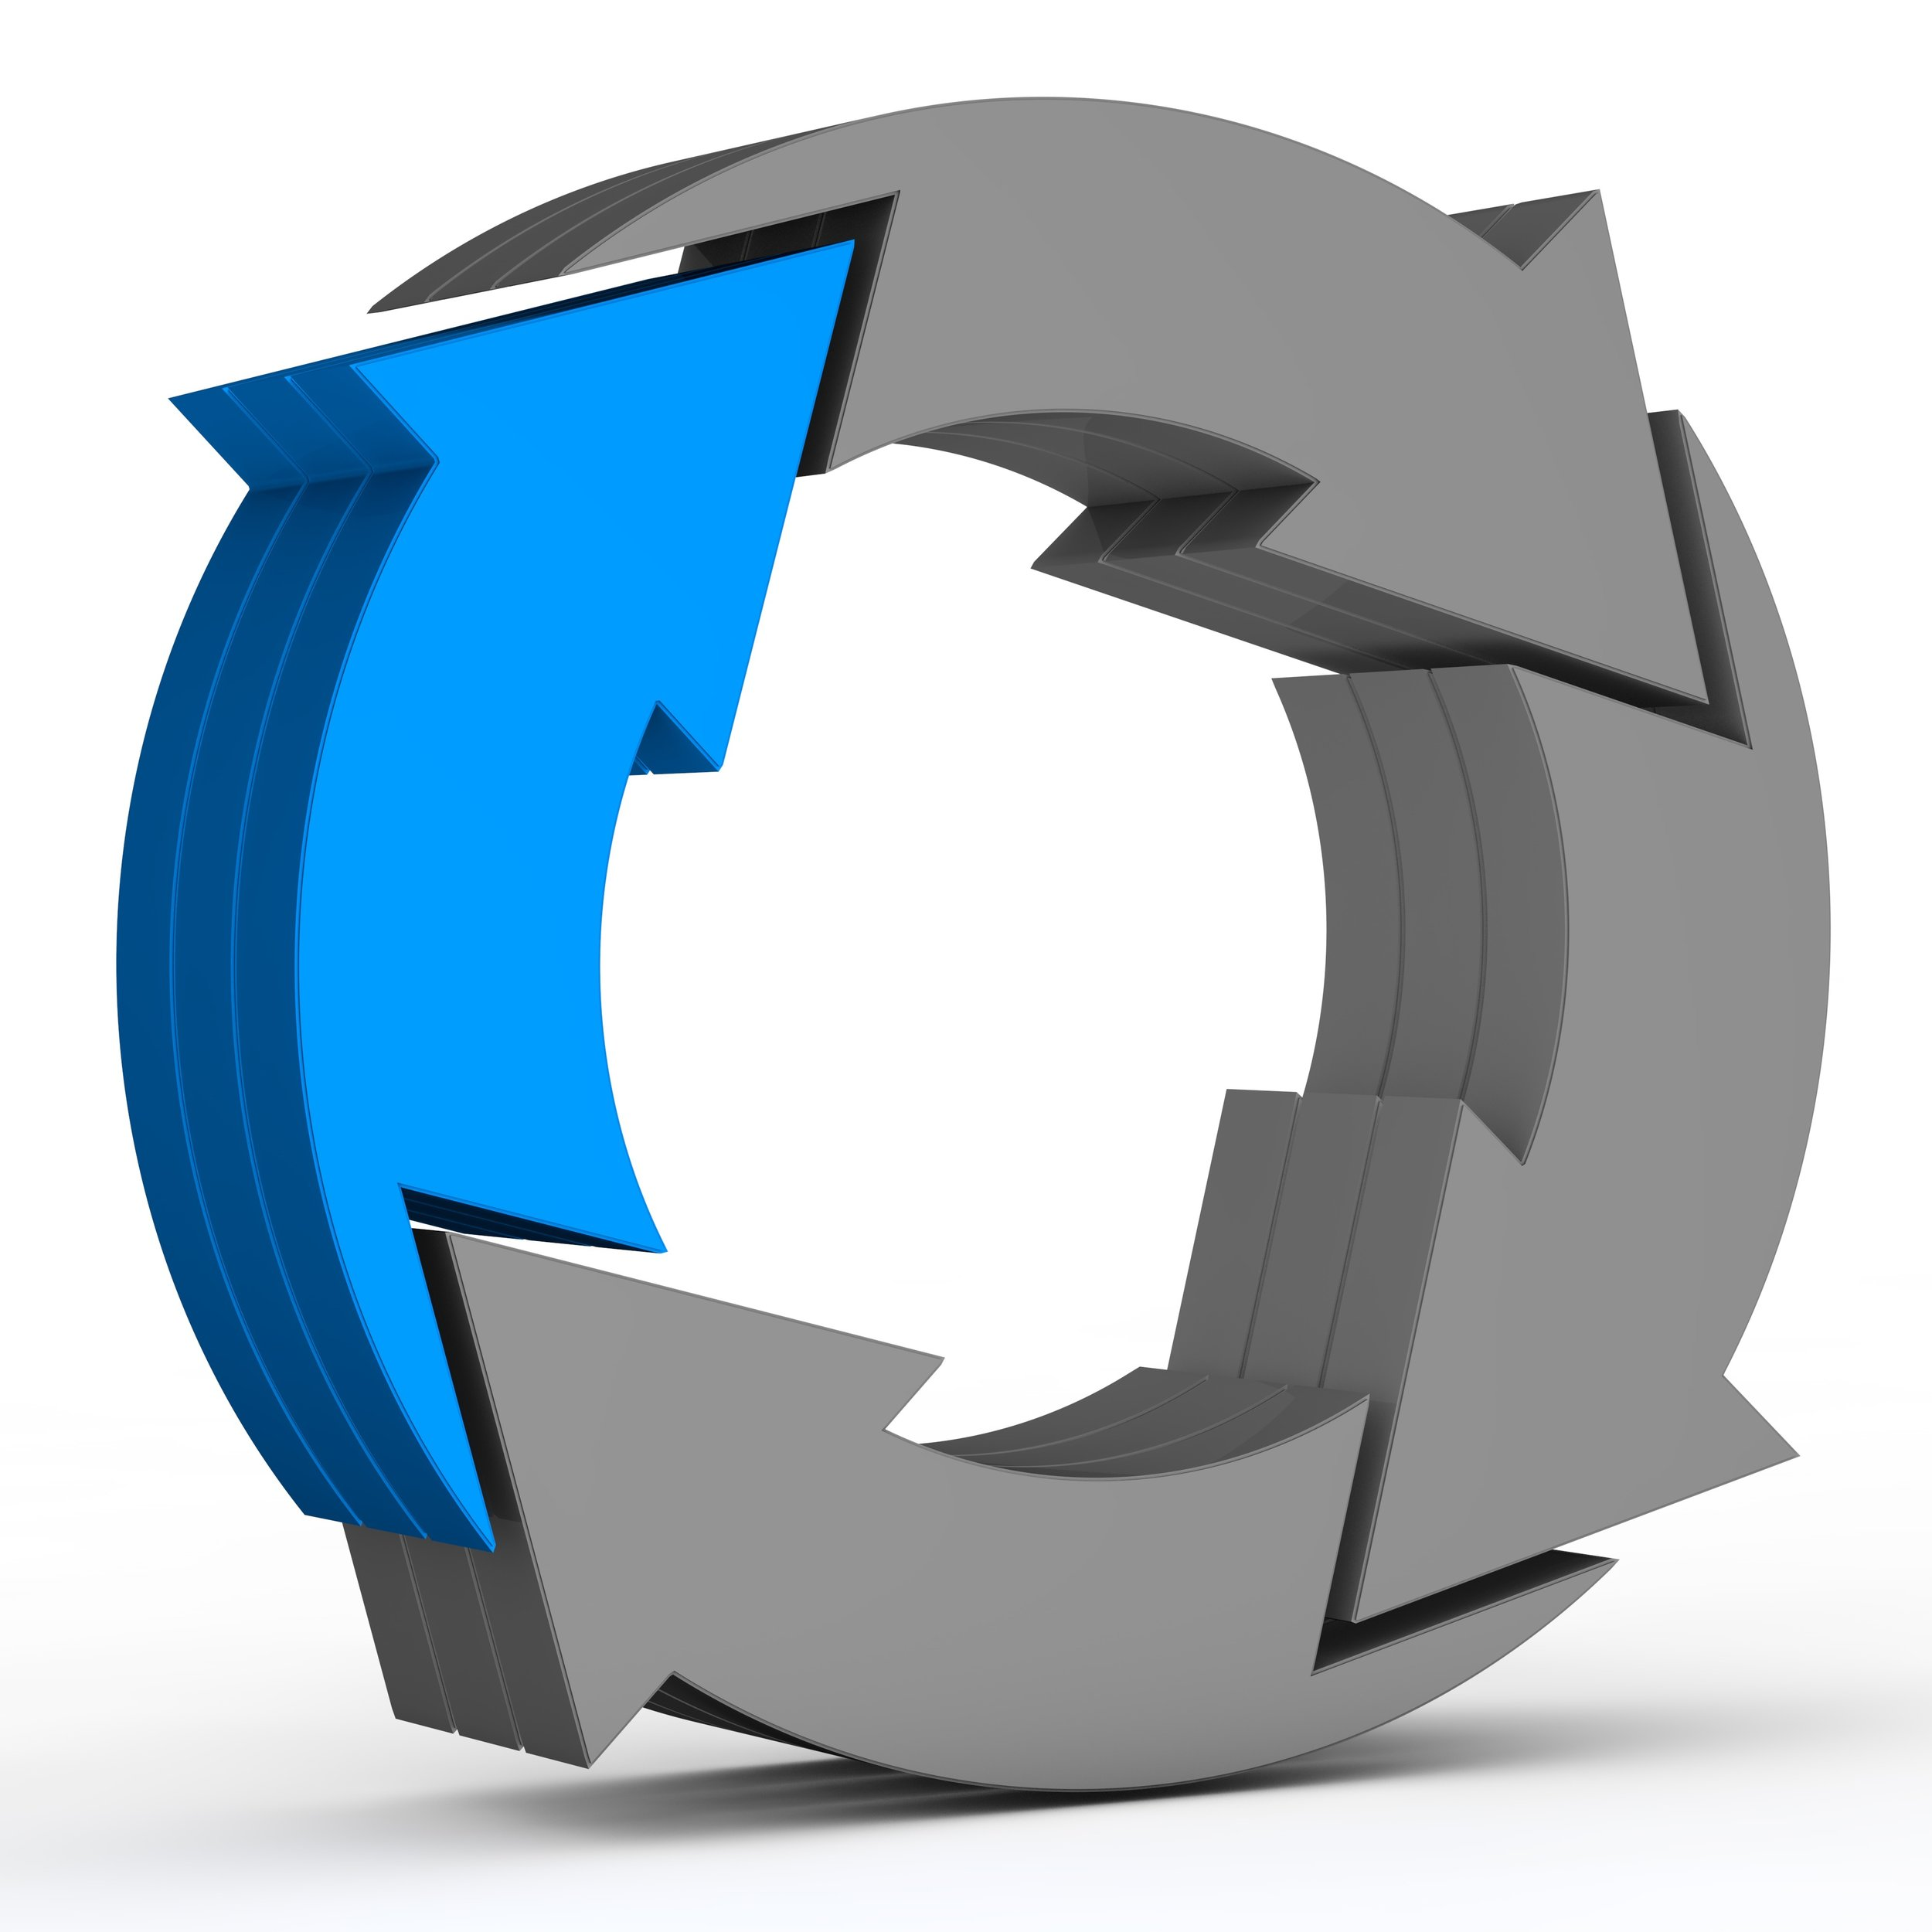 Omni-Channel Fulfillment: Three Ways to Improve Reverse Logistics